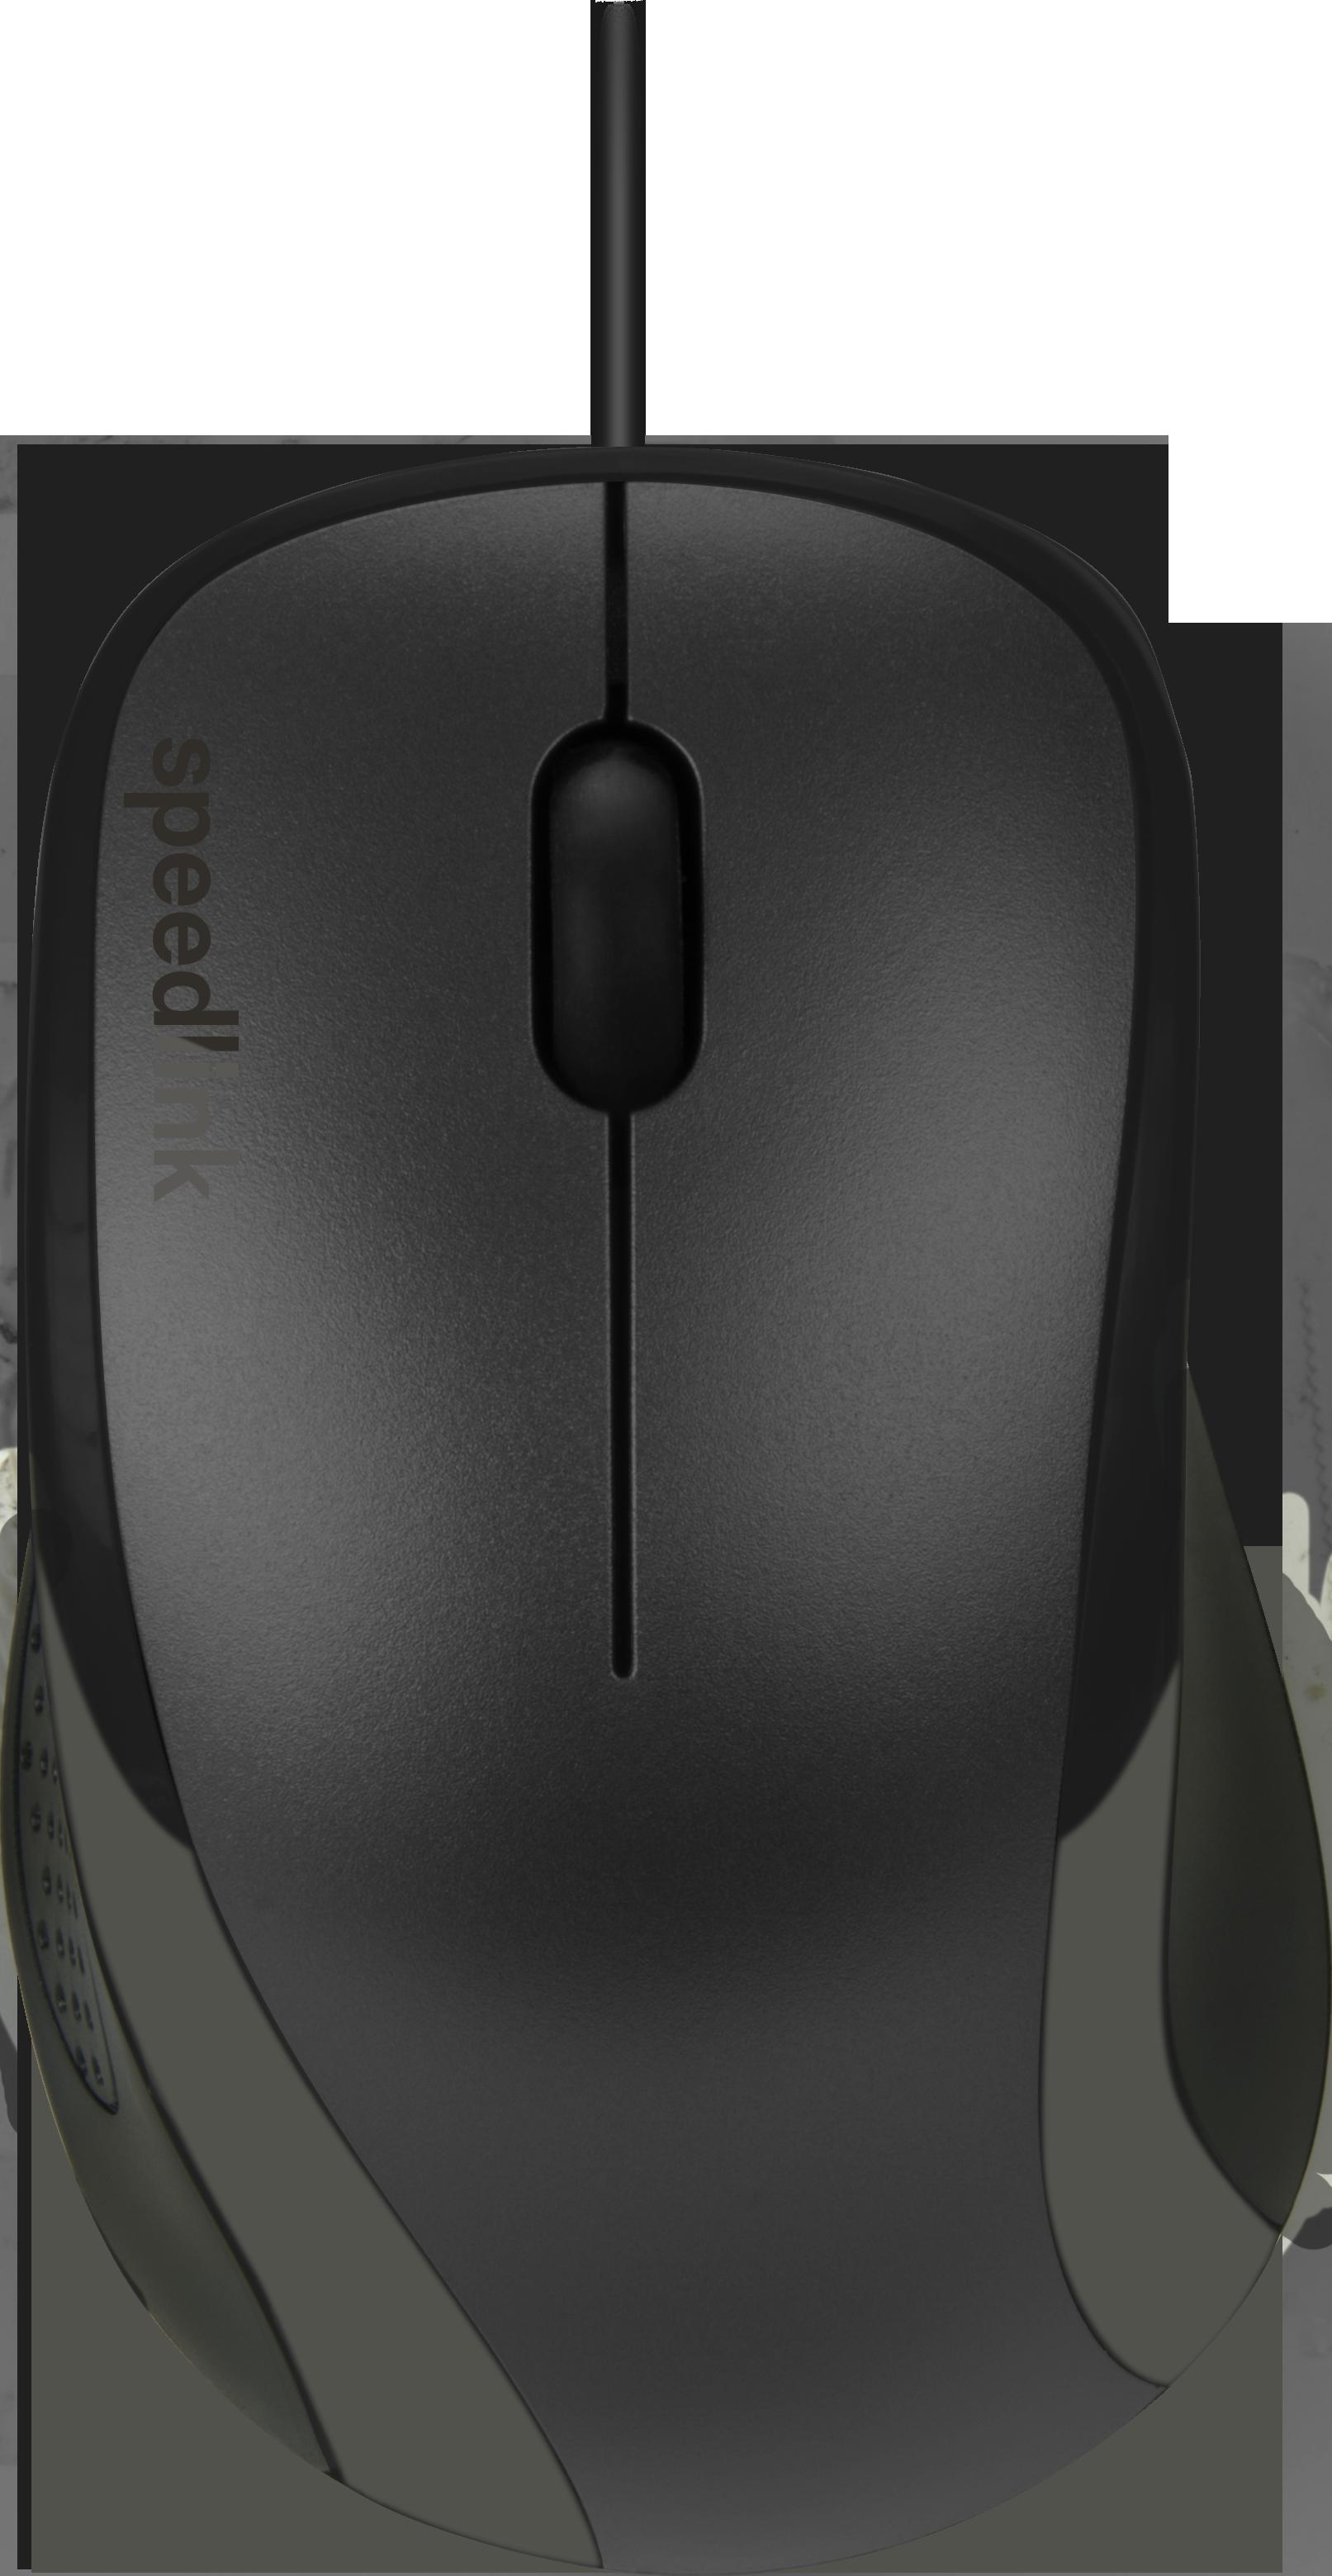 KAPPA Mouse - USB, black